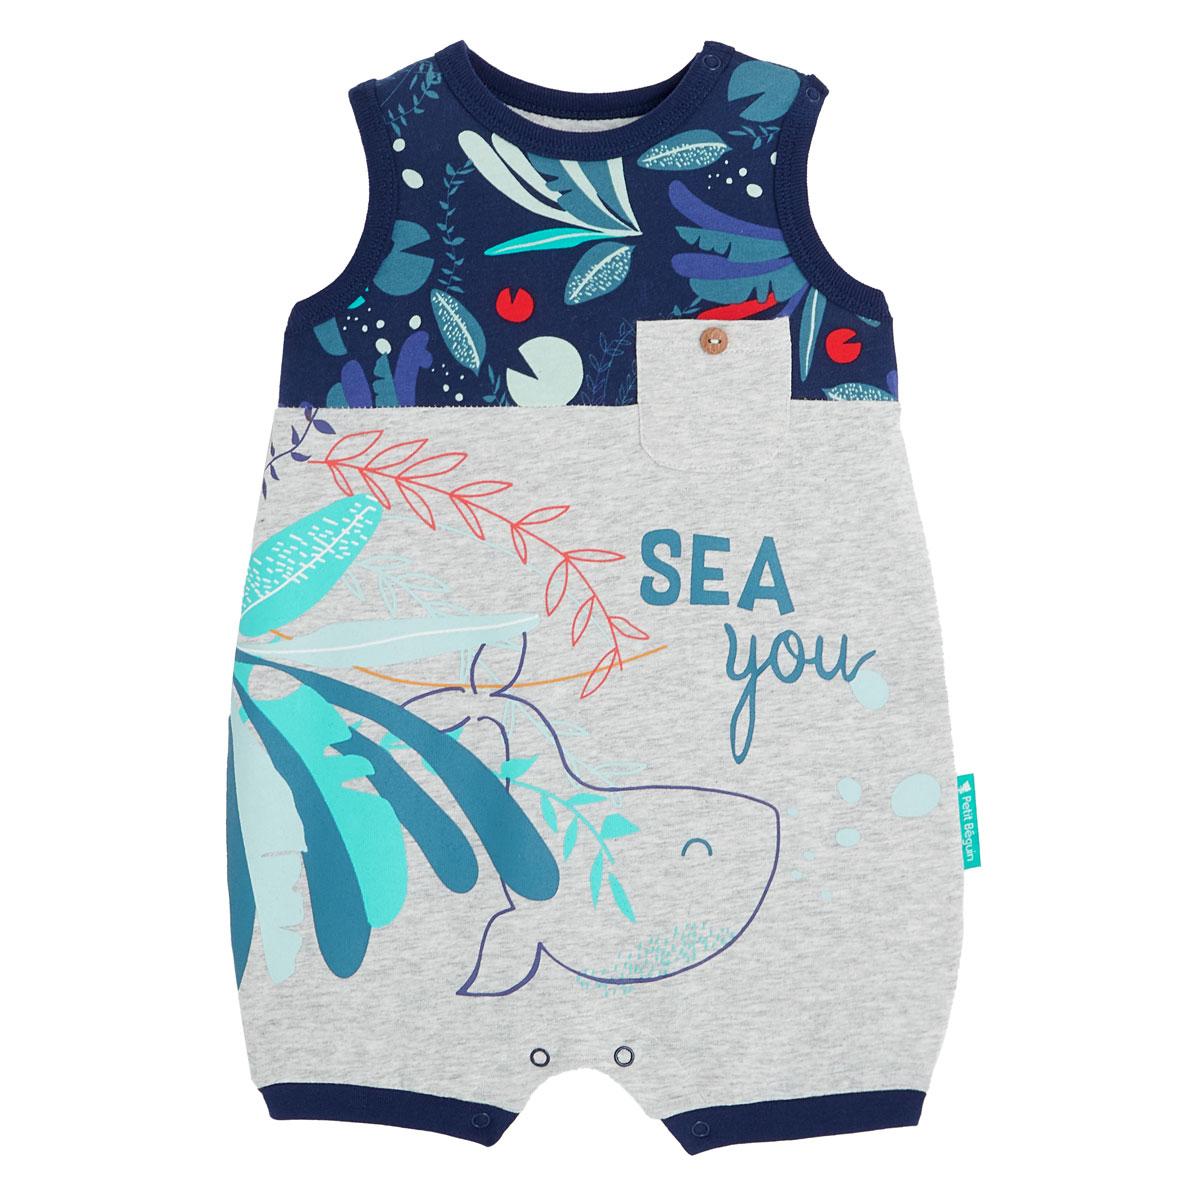 Barboteuse bébé garçon contenant du coton bio Sea You